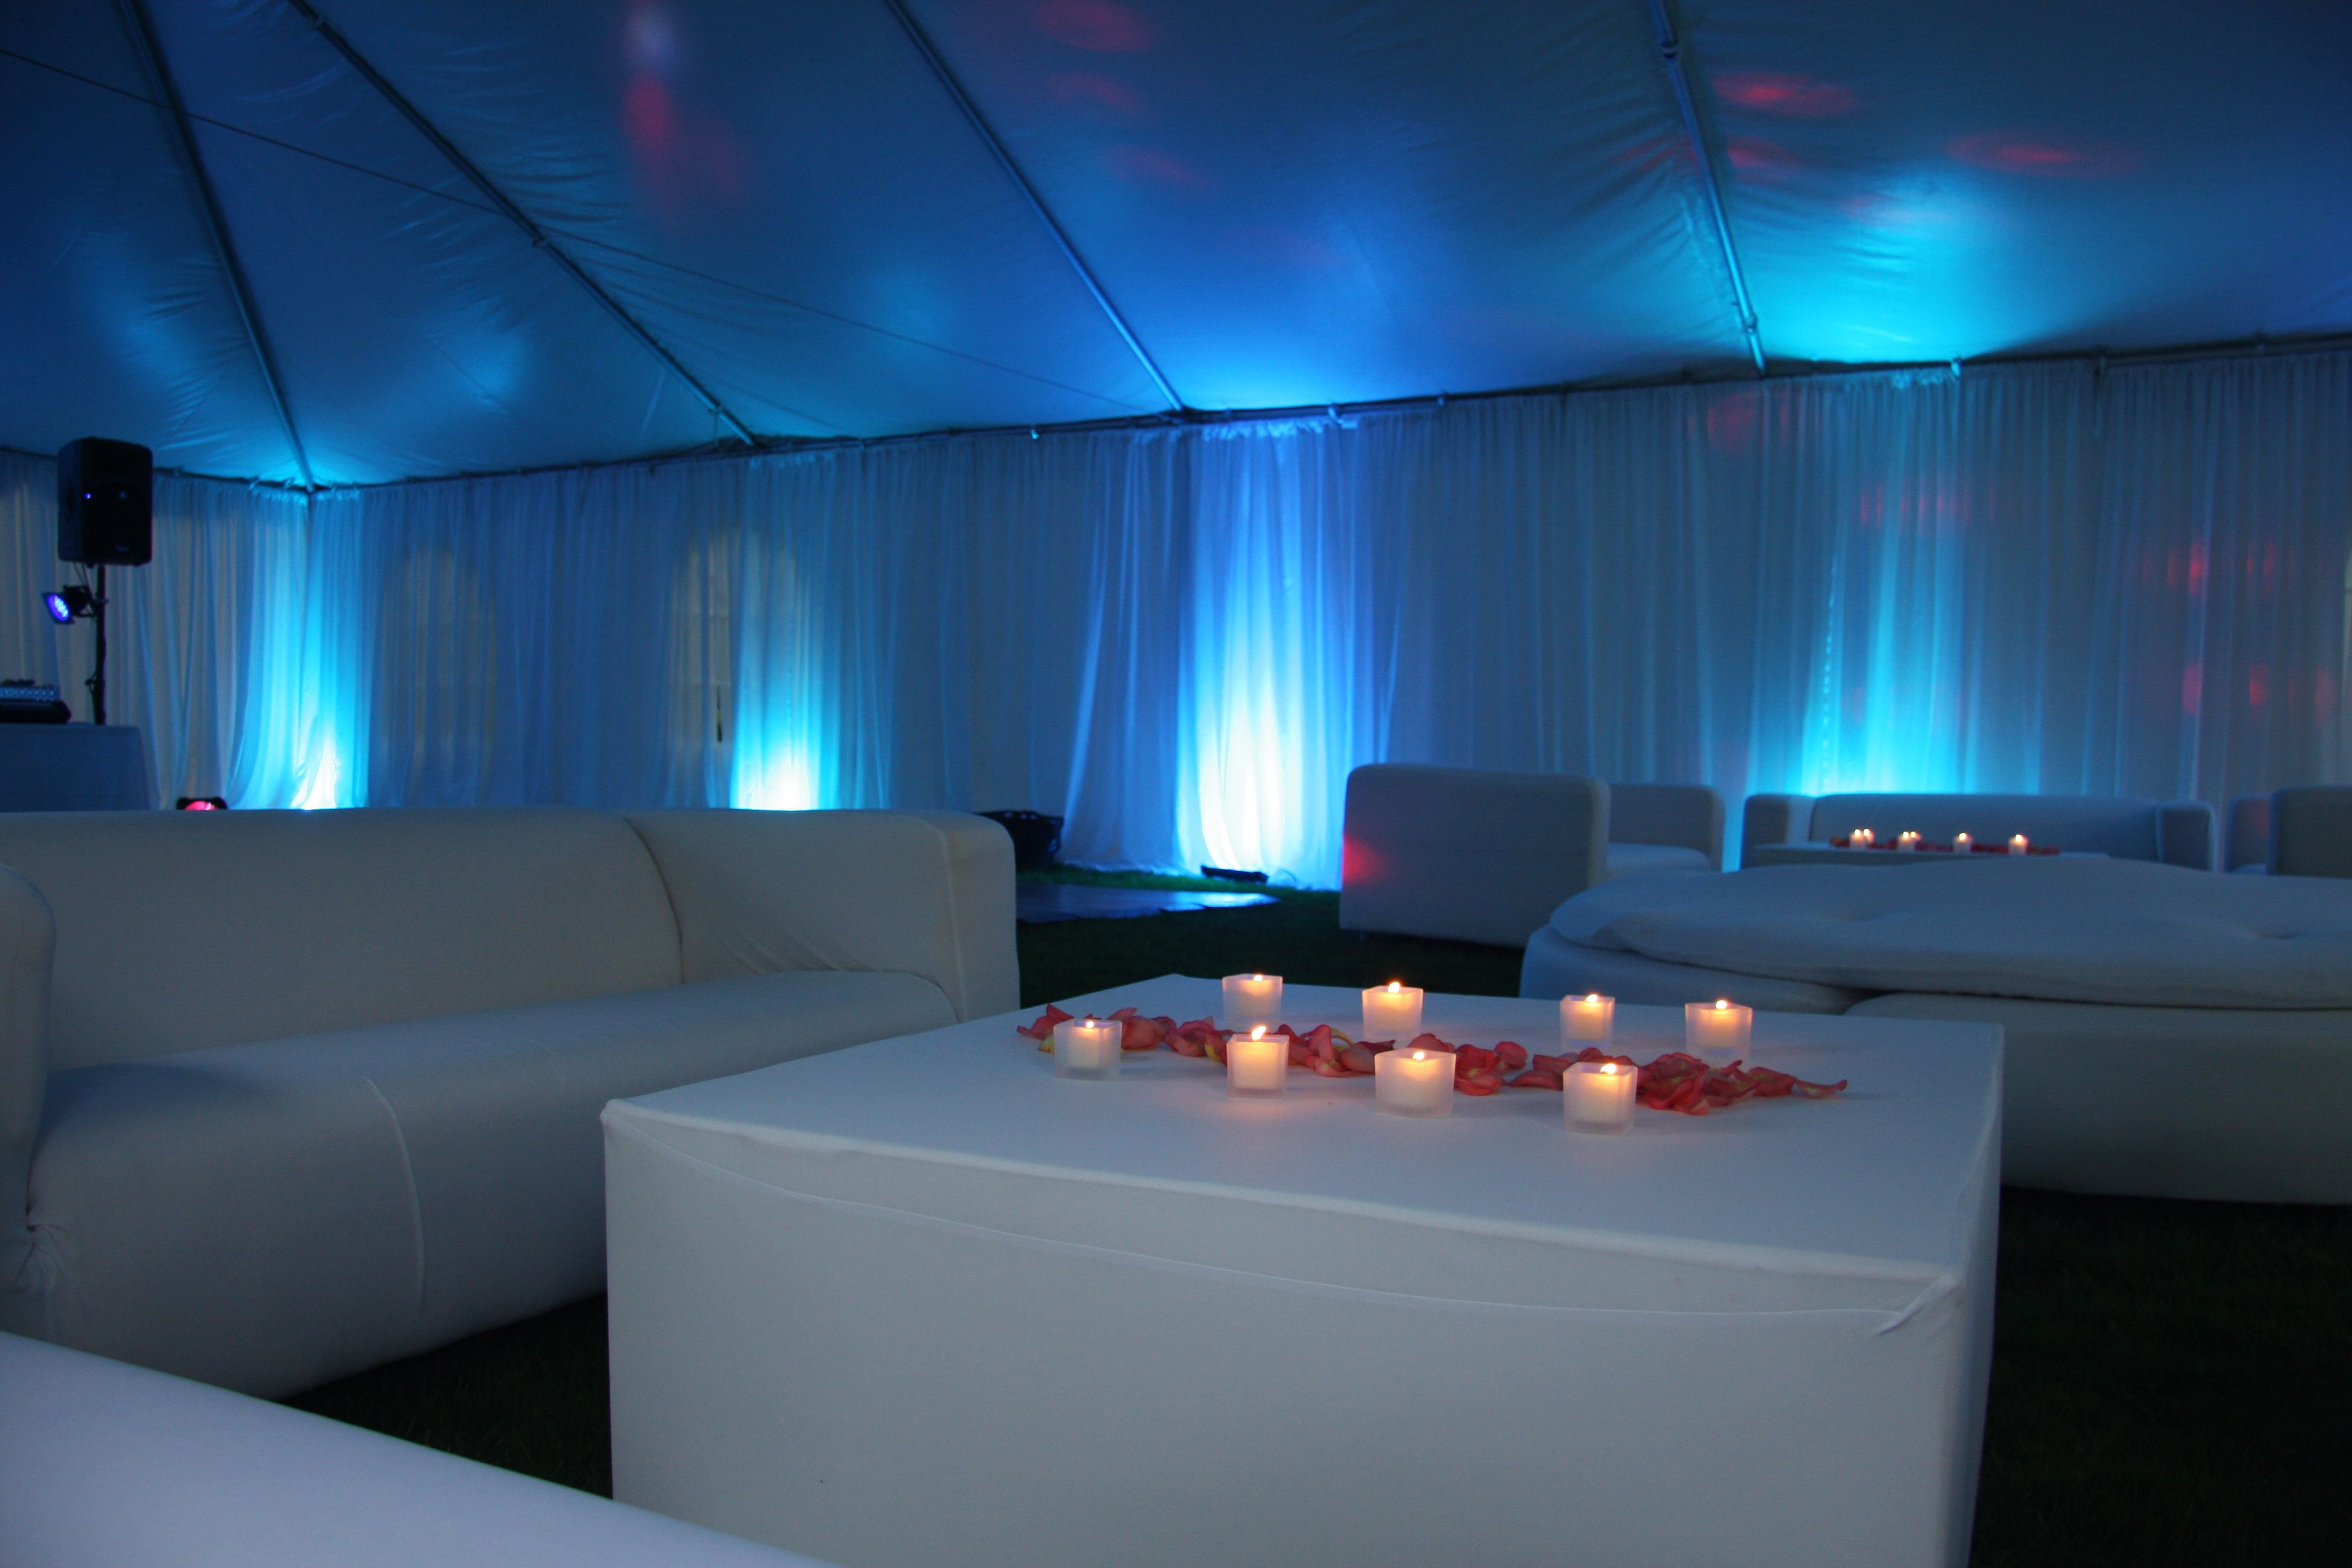 quinceanera decor lights - Google Search | quinceñera | Pinterest